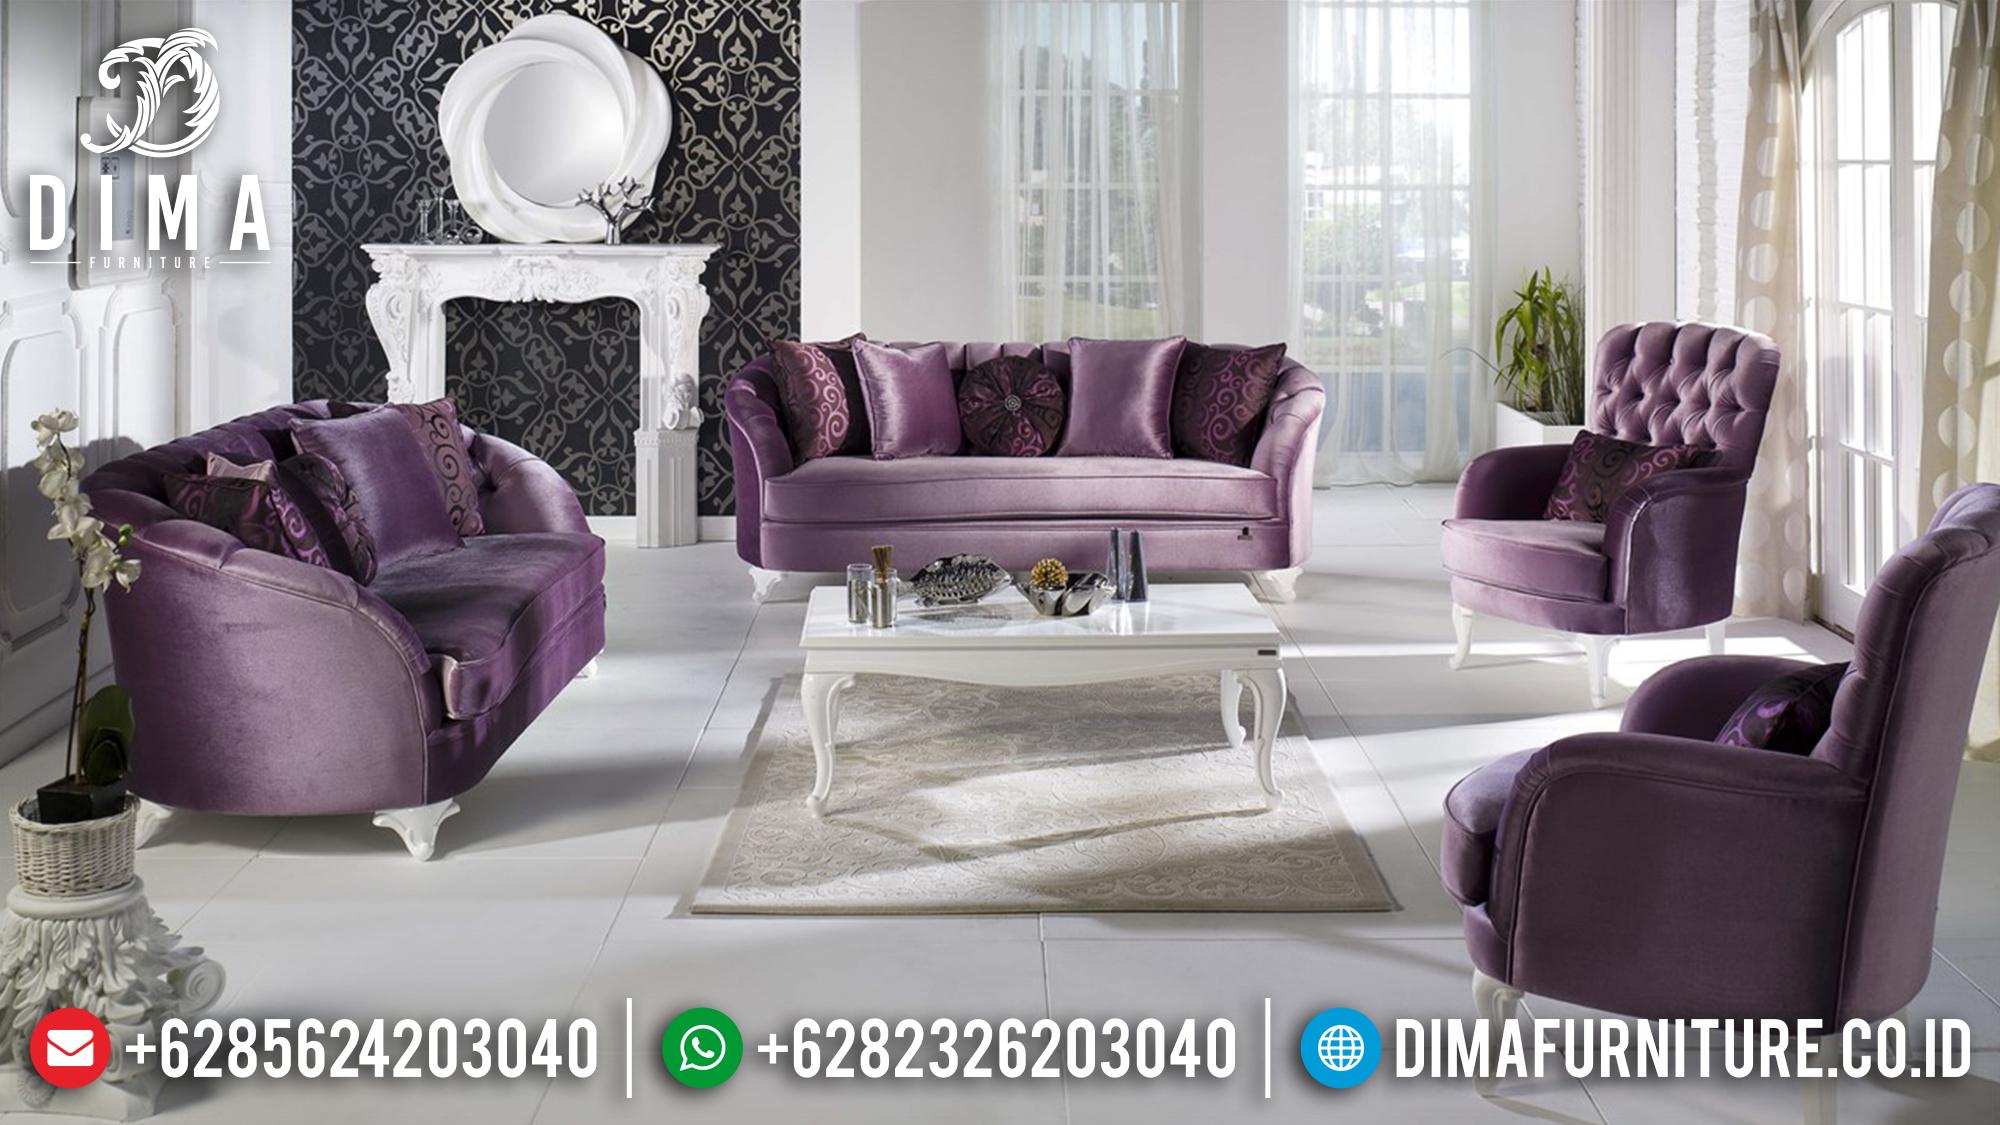 Set Sofa Tamu Jepara Mewah Minimalis Victoria Koltuk 3 2 1 1 MMJ-0125